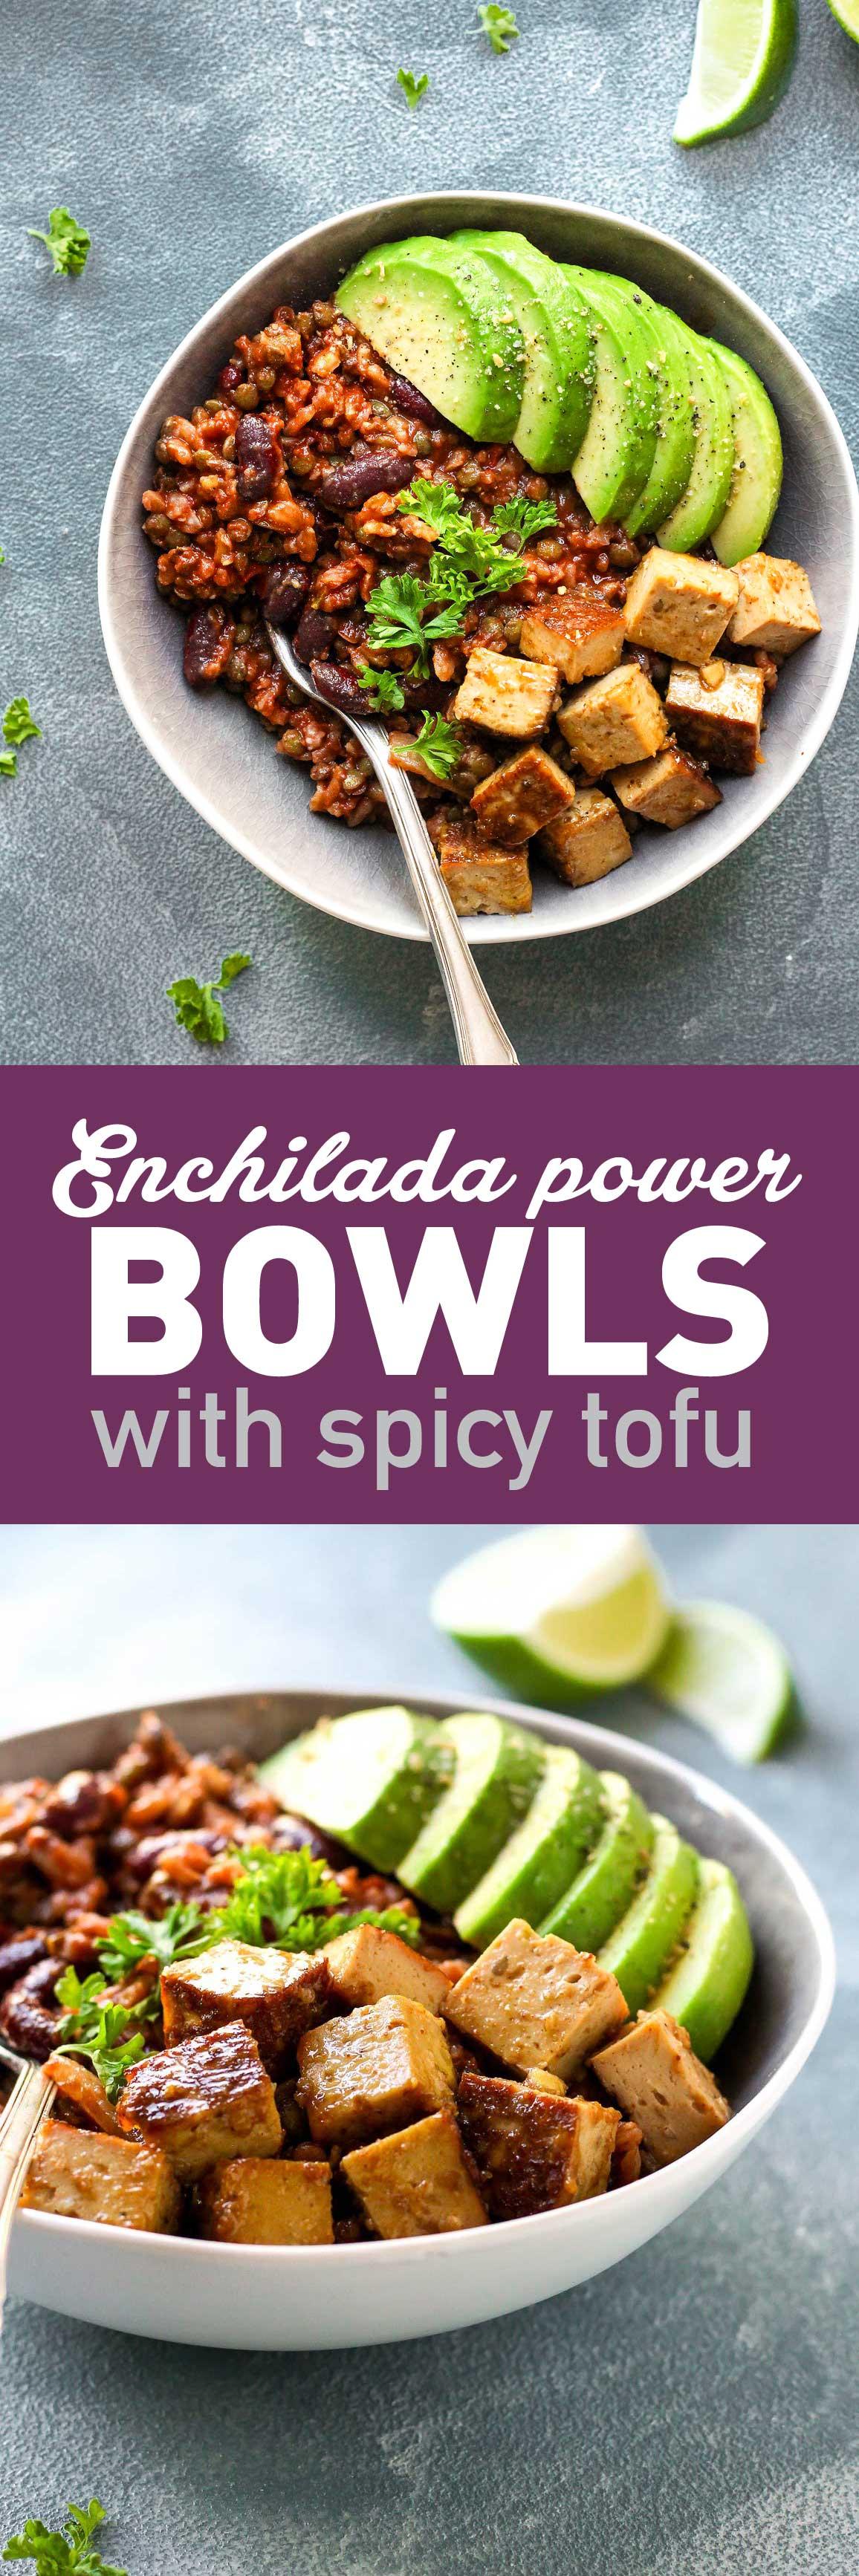 vegan-enchilada-power-bowls-with-spicy-tofu-thumb-3